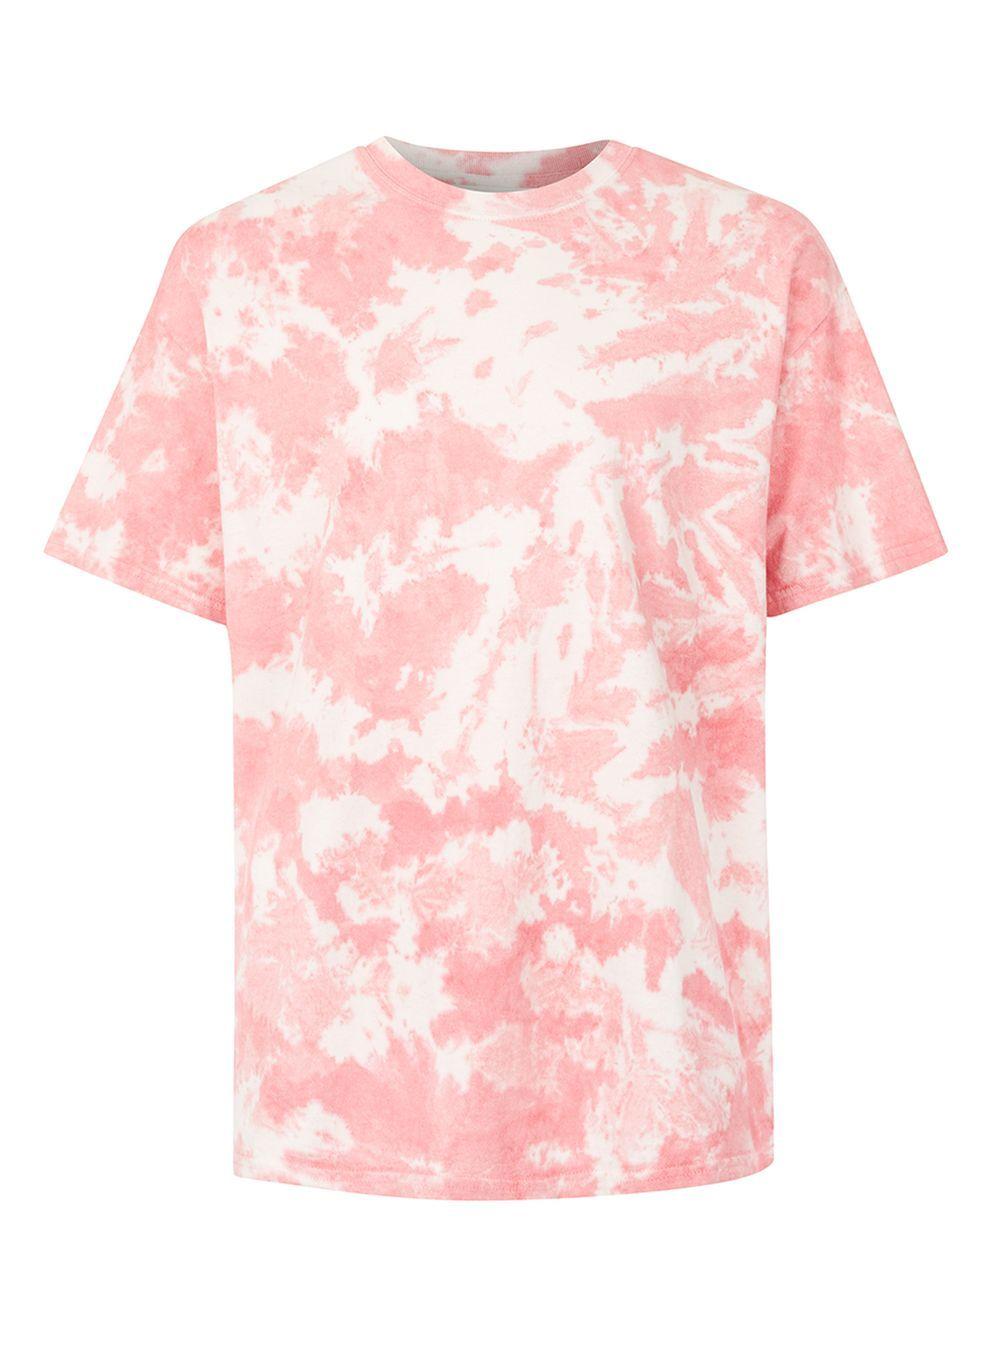 b28e700fc1c96c02f0eb1deee7d11e61 - How To Get Pink Out Of A White T Shirt